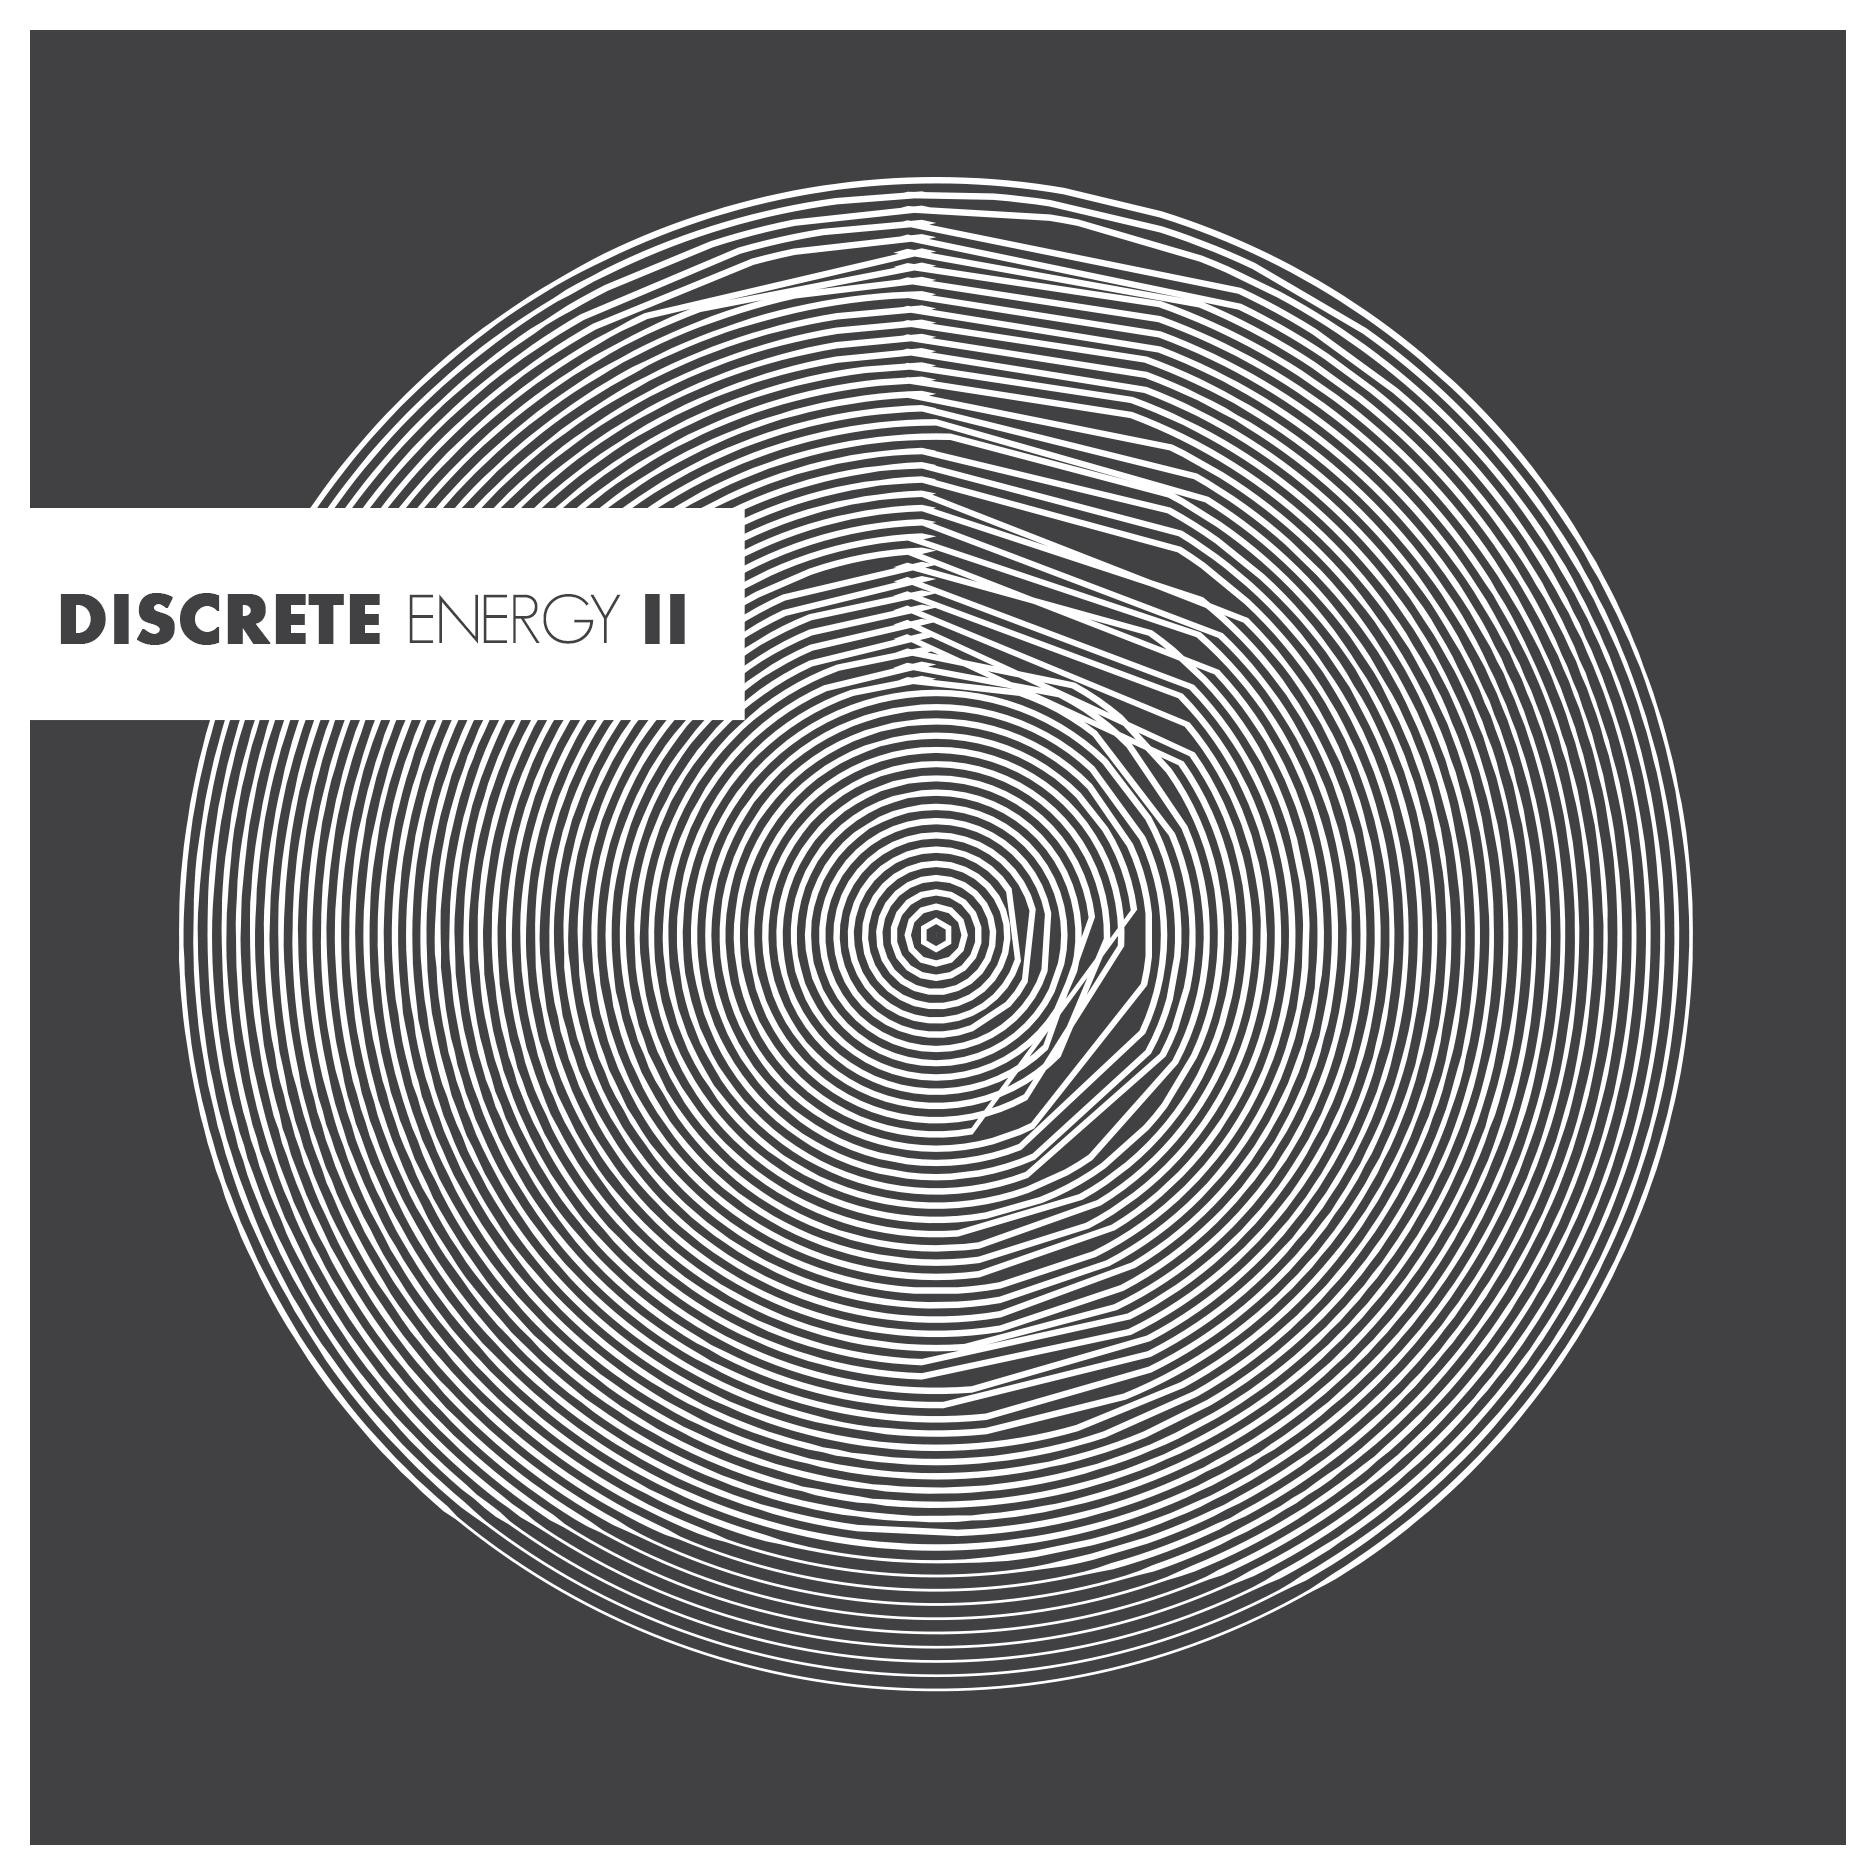 Discrete Energy II